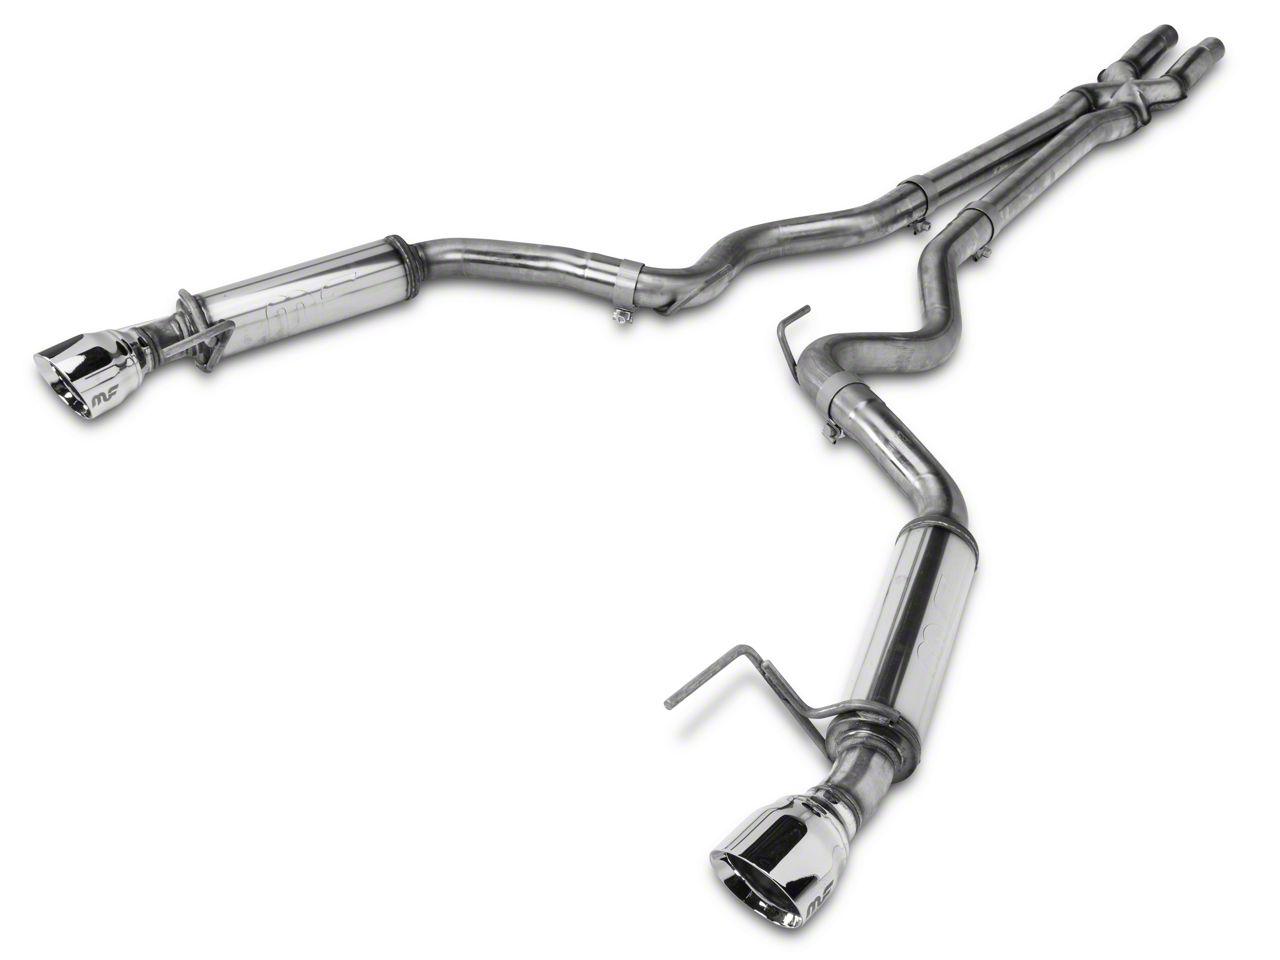 Magnaflow Competition Cat-Back Exhaust (15-17 V6)